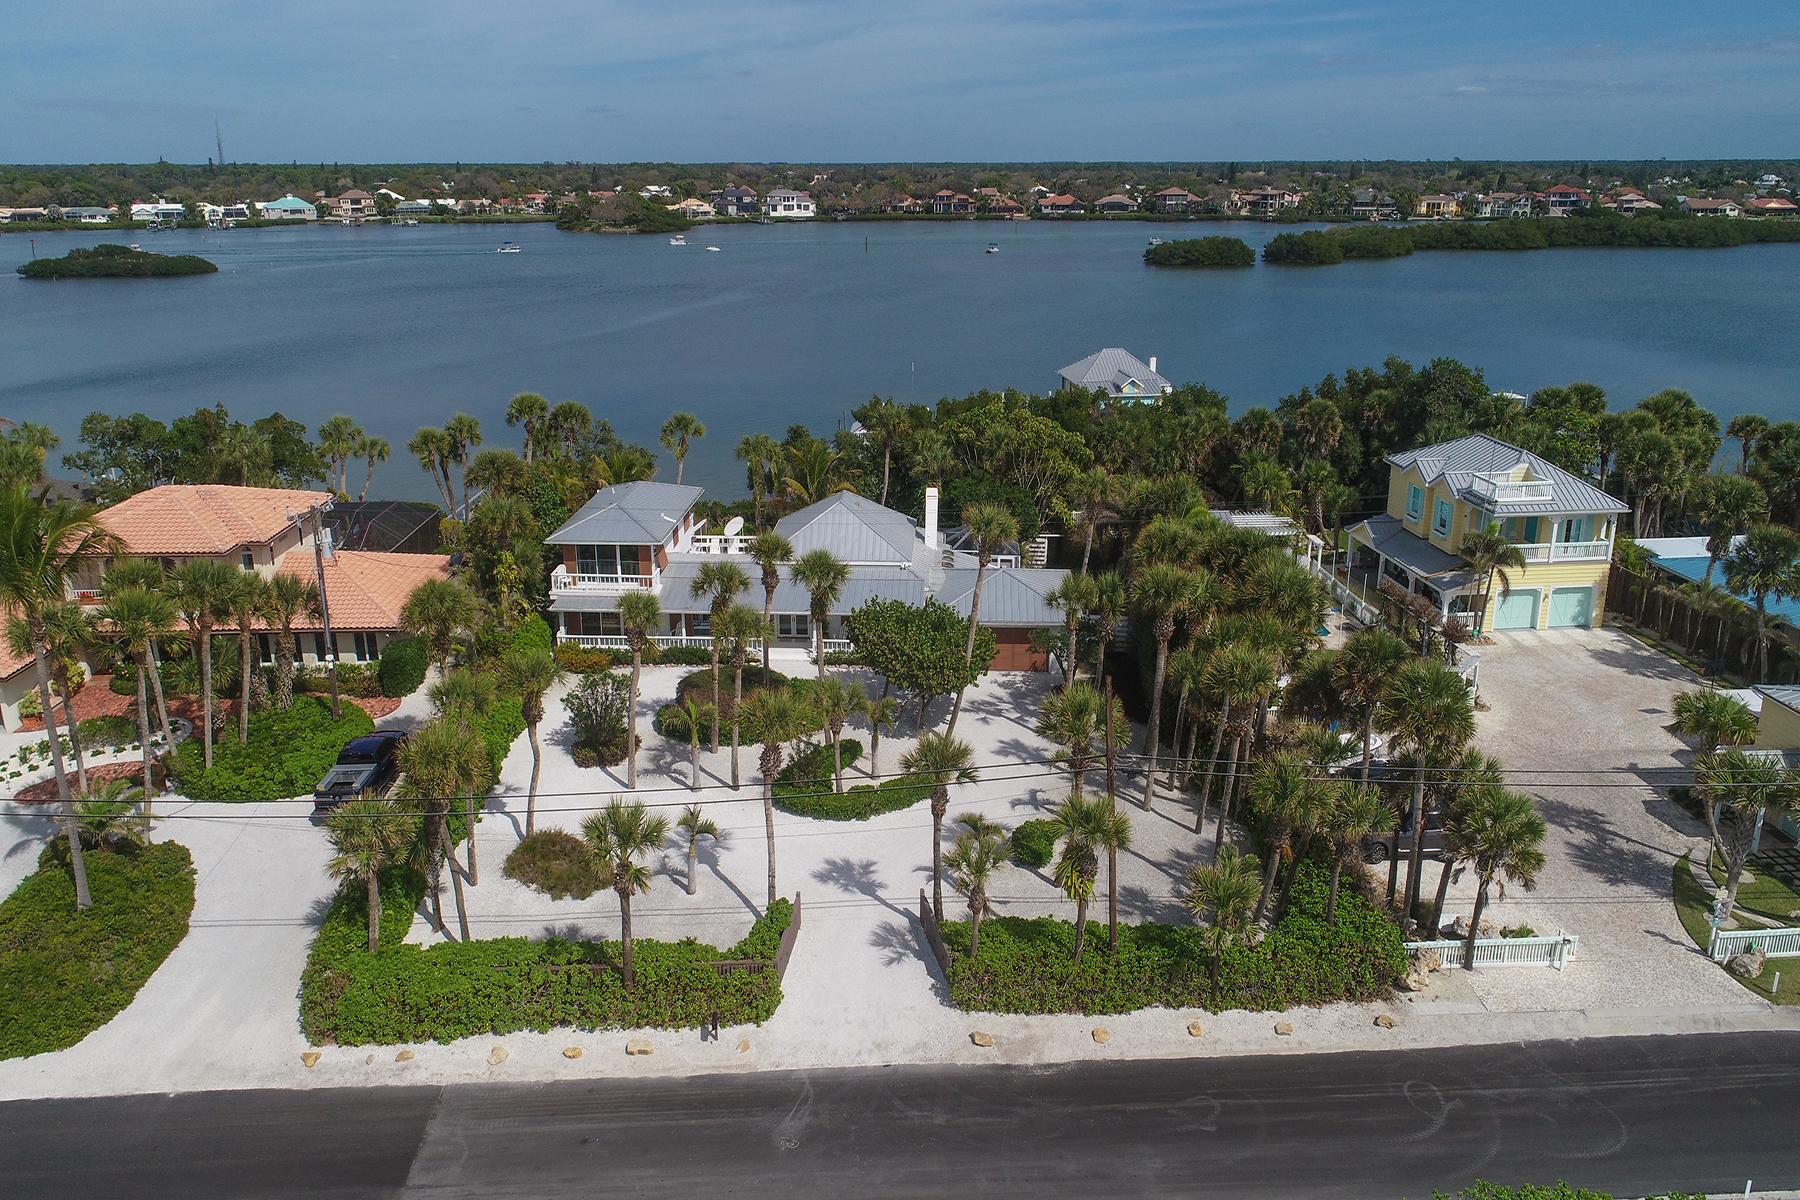 Land for Sale at 3298 Casey Key Rd Rd, Nokomis, Florida 34275 United States